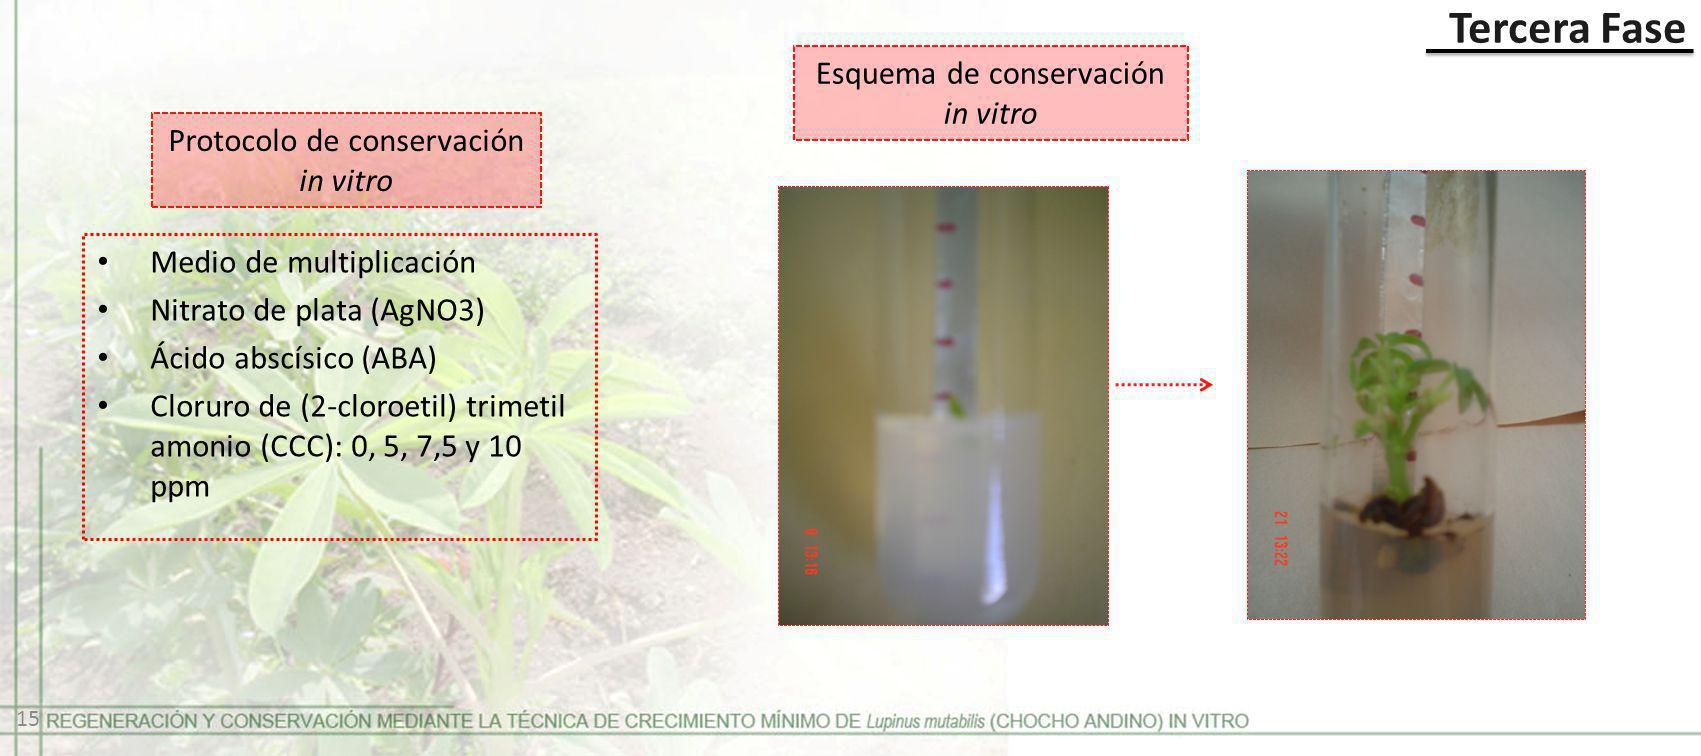 Tercera Fase Protocolo de conservación in vitro Medio de multiplicación Nitrato de plata (AgNO3) Ácido abscísico (ABA) Cloruro de (2-cloroetil) trimet